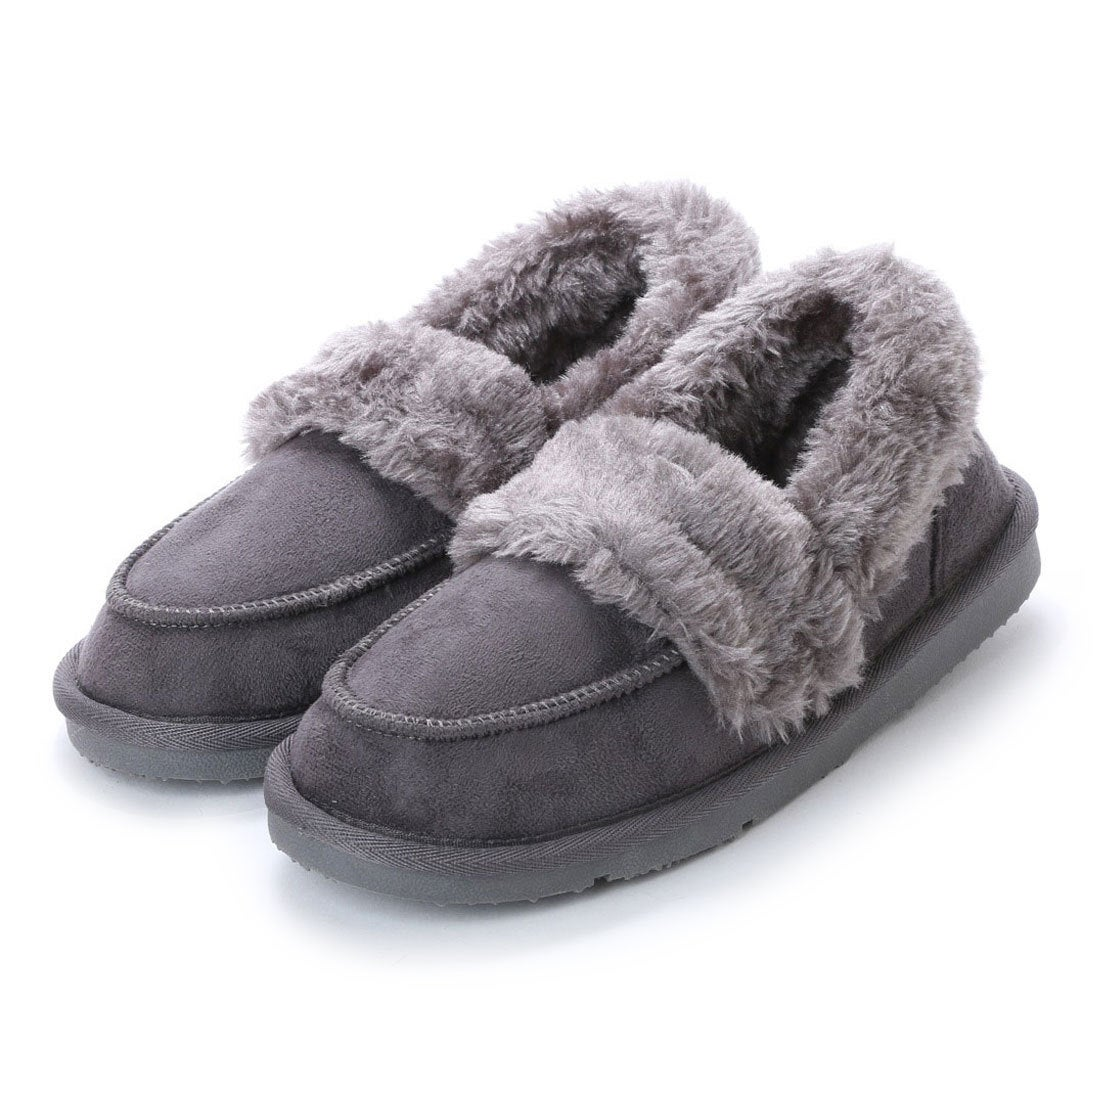 edc3231d036b0 シュガー シュガー Sugar Sugar インファースリッポン (GY S) -靴&ファッション通販 ロコンド〜自宅で試着、気軽に返品